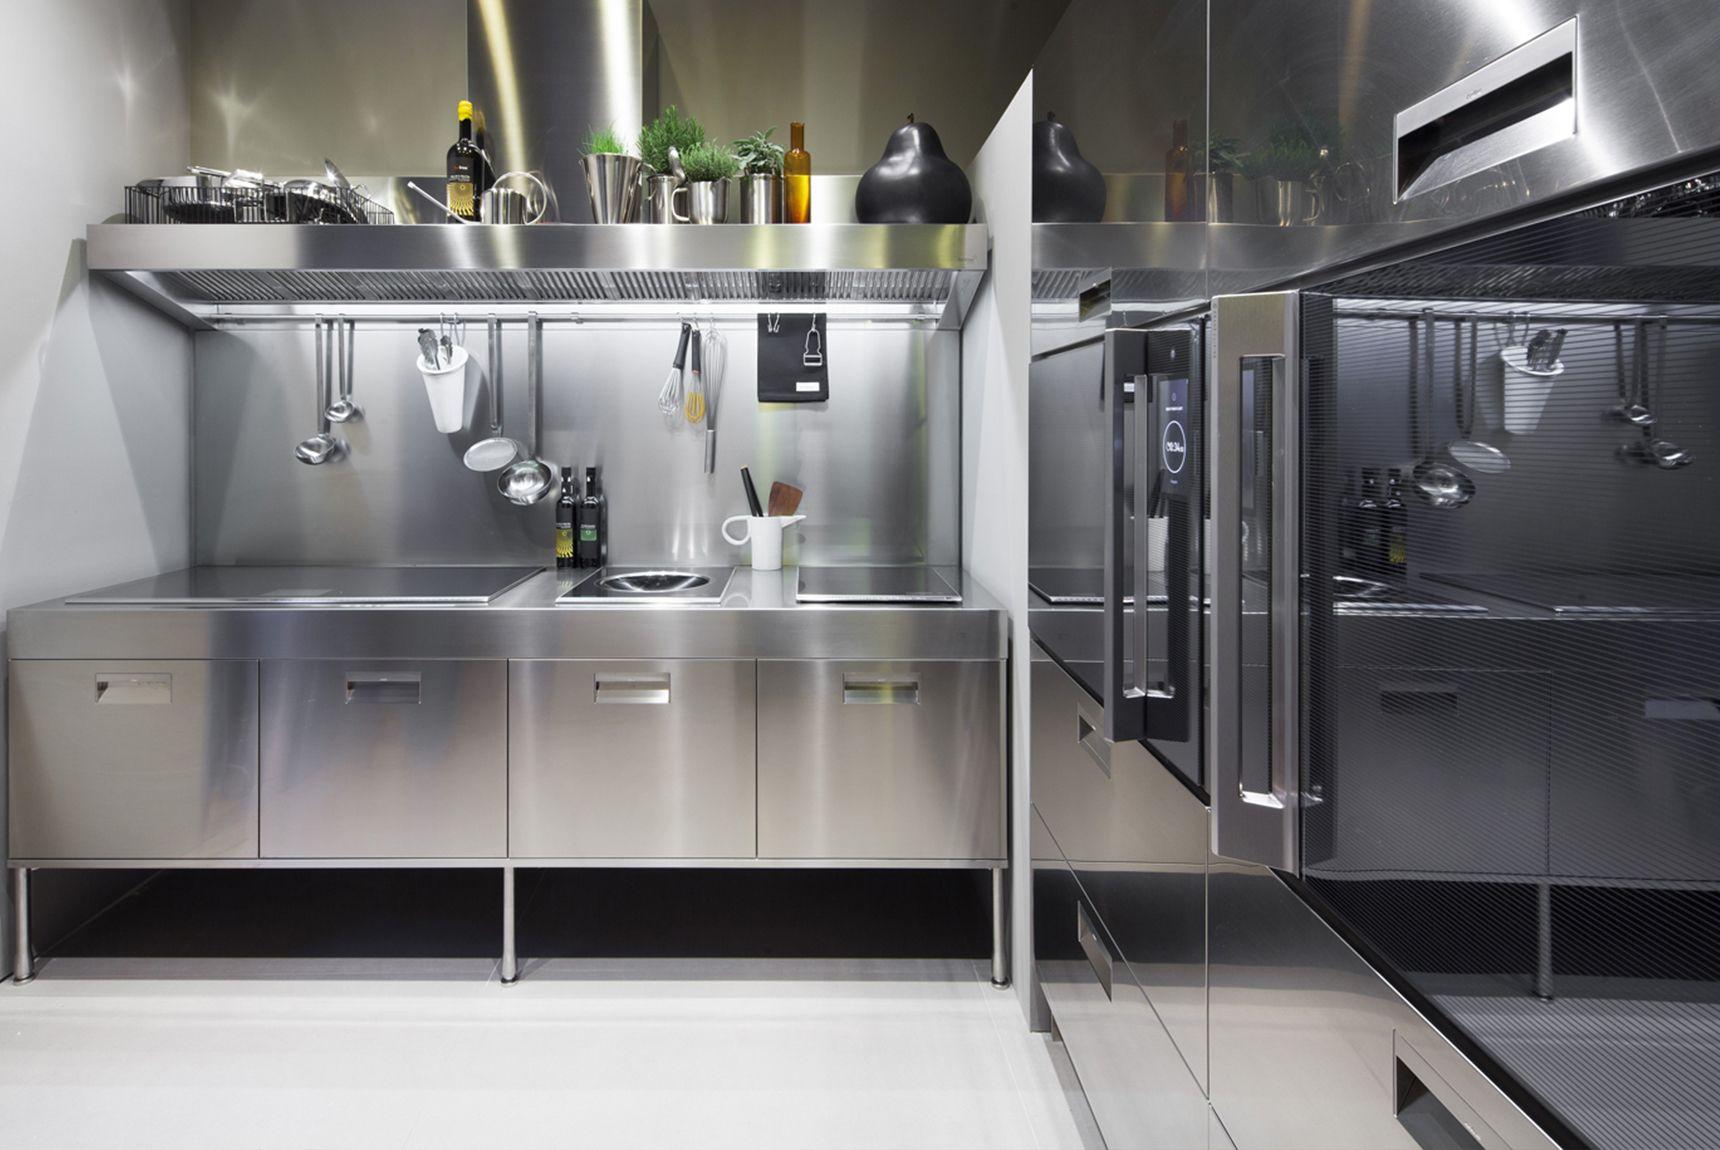 Gallery of come avere una cucina professionale a casa - Cucina ...